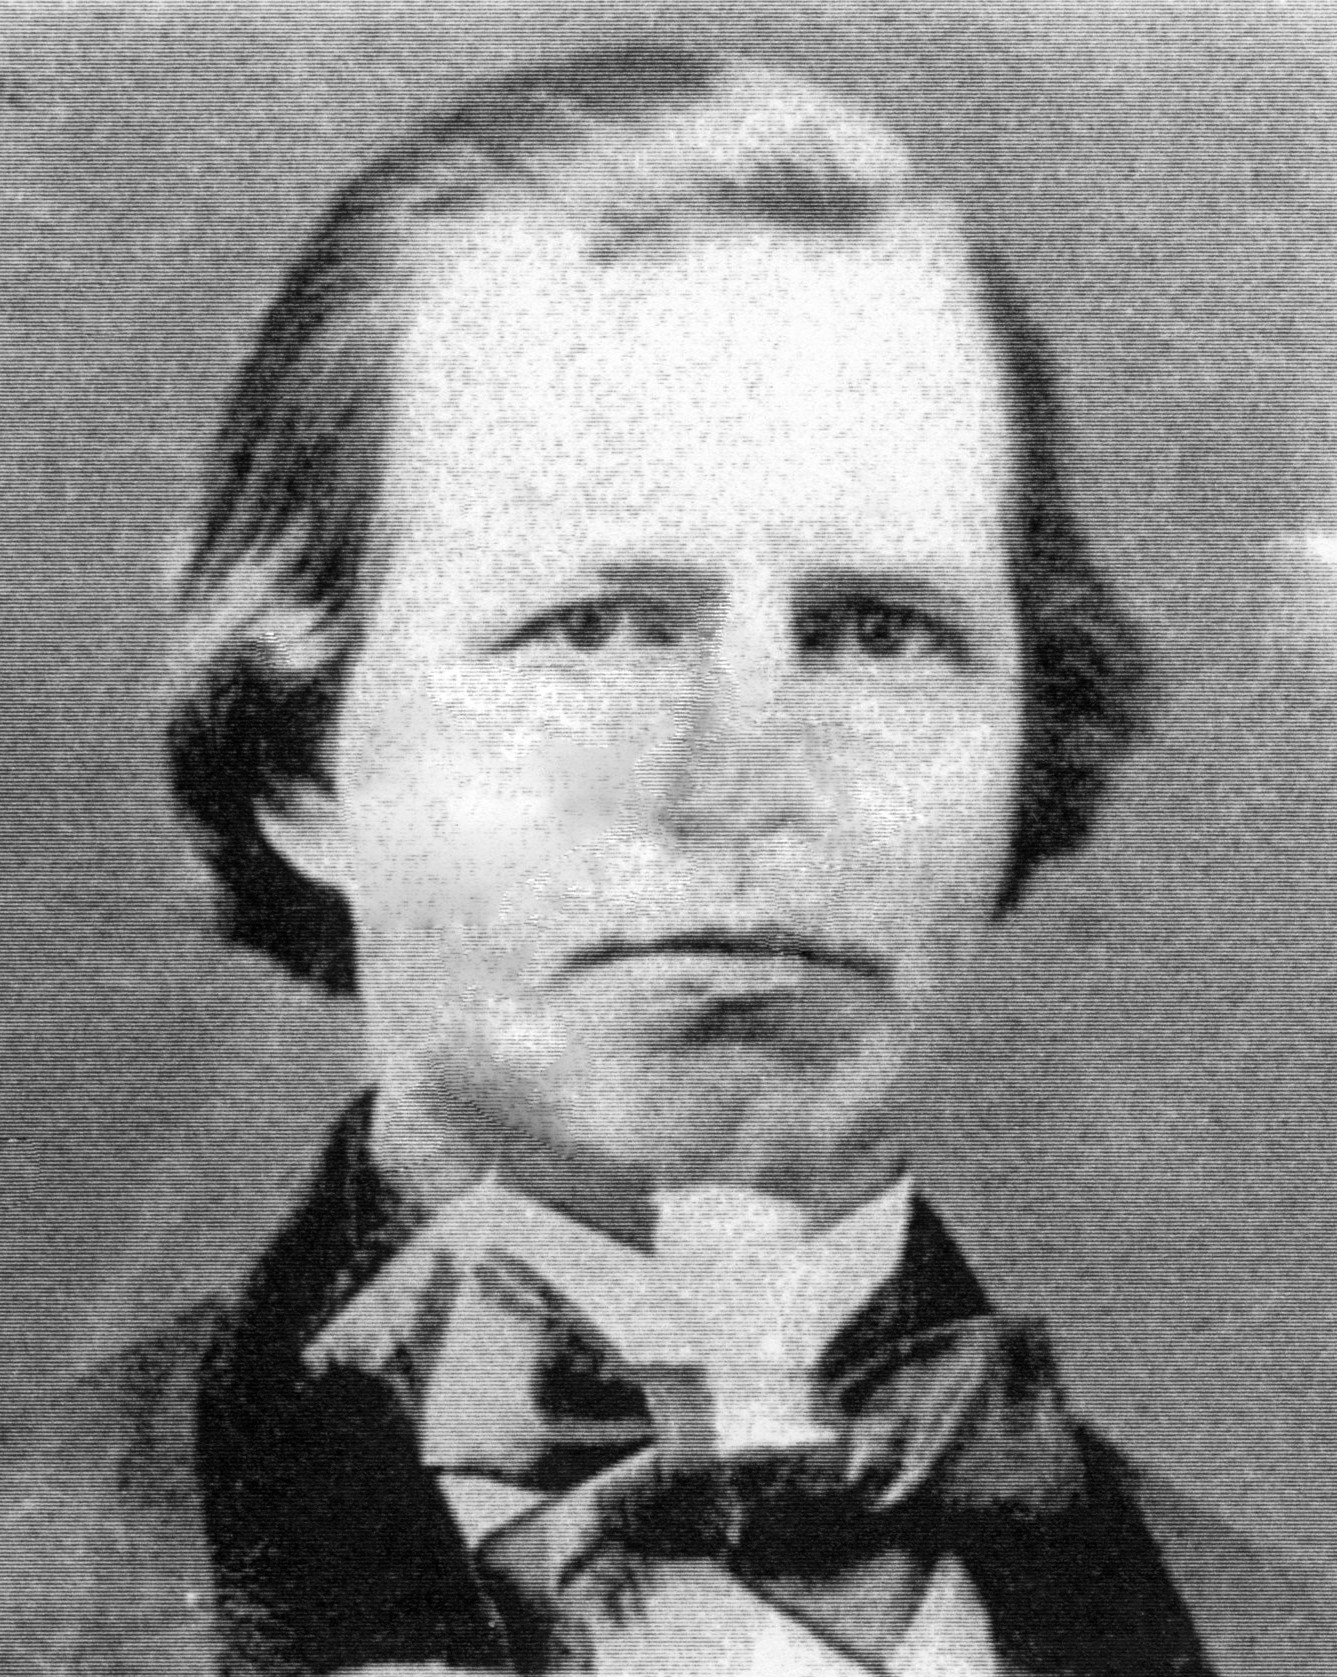 Smith, George Briggs